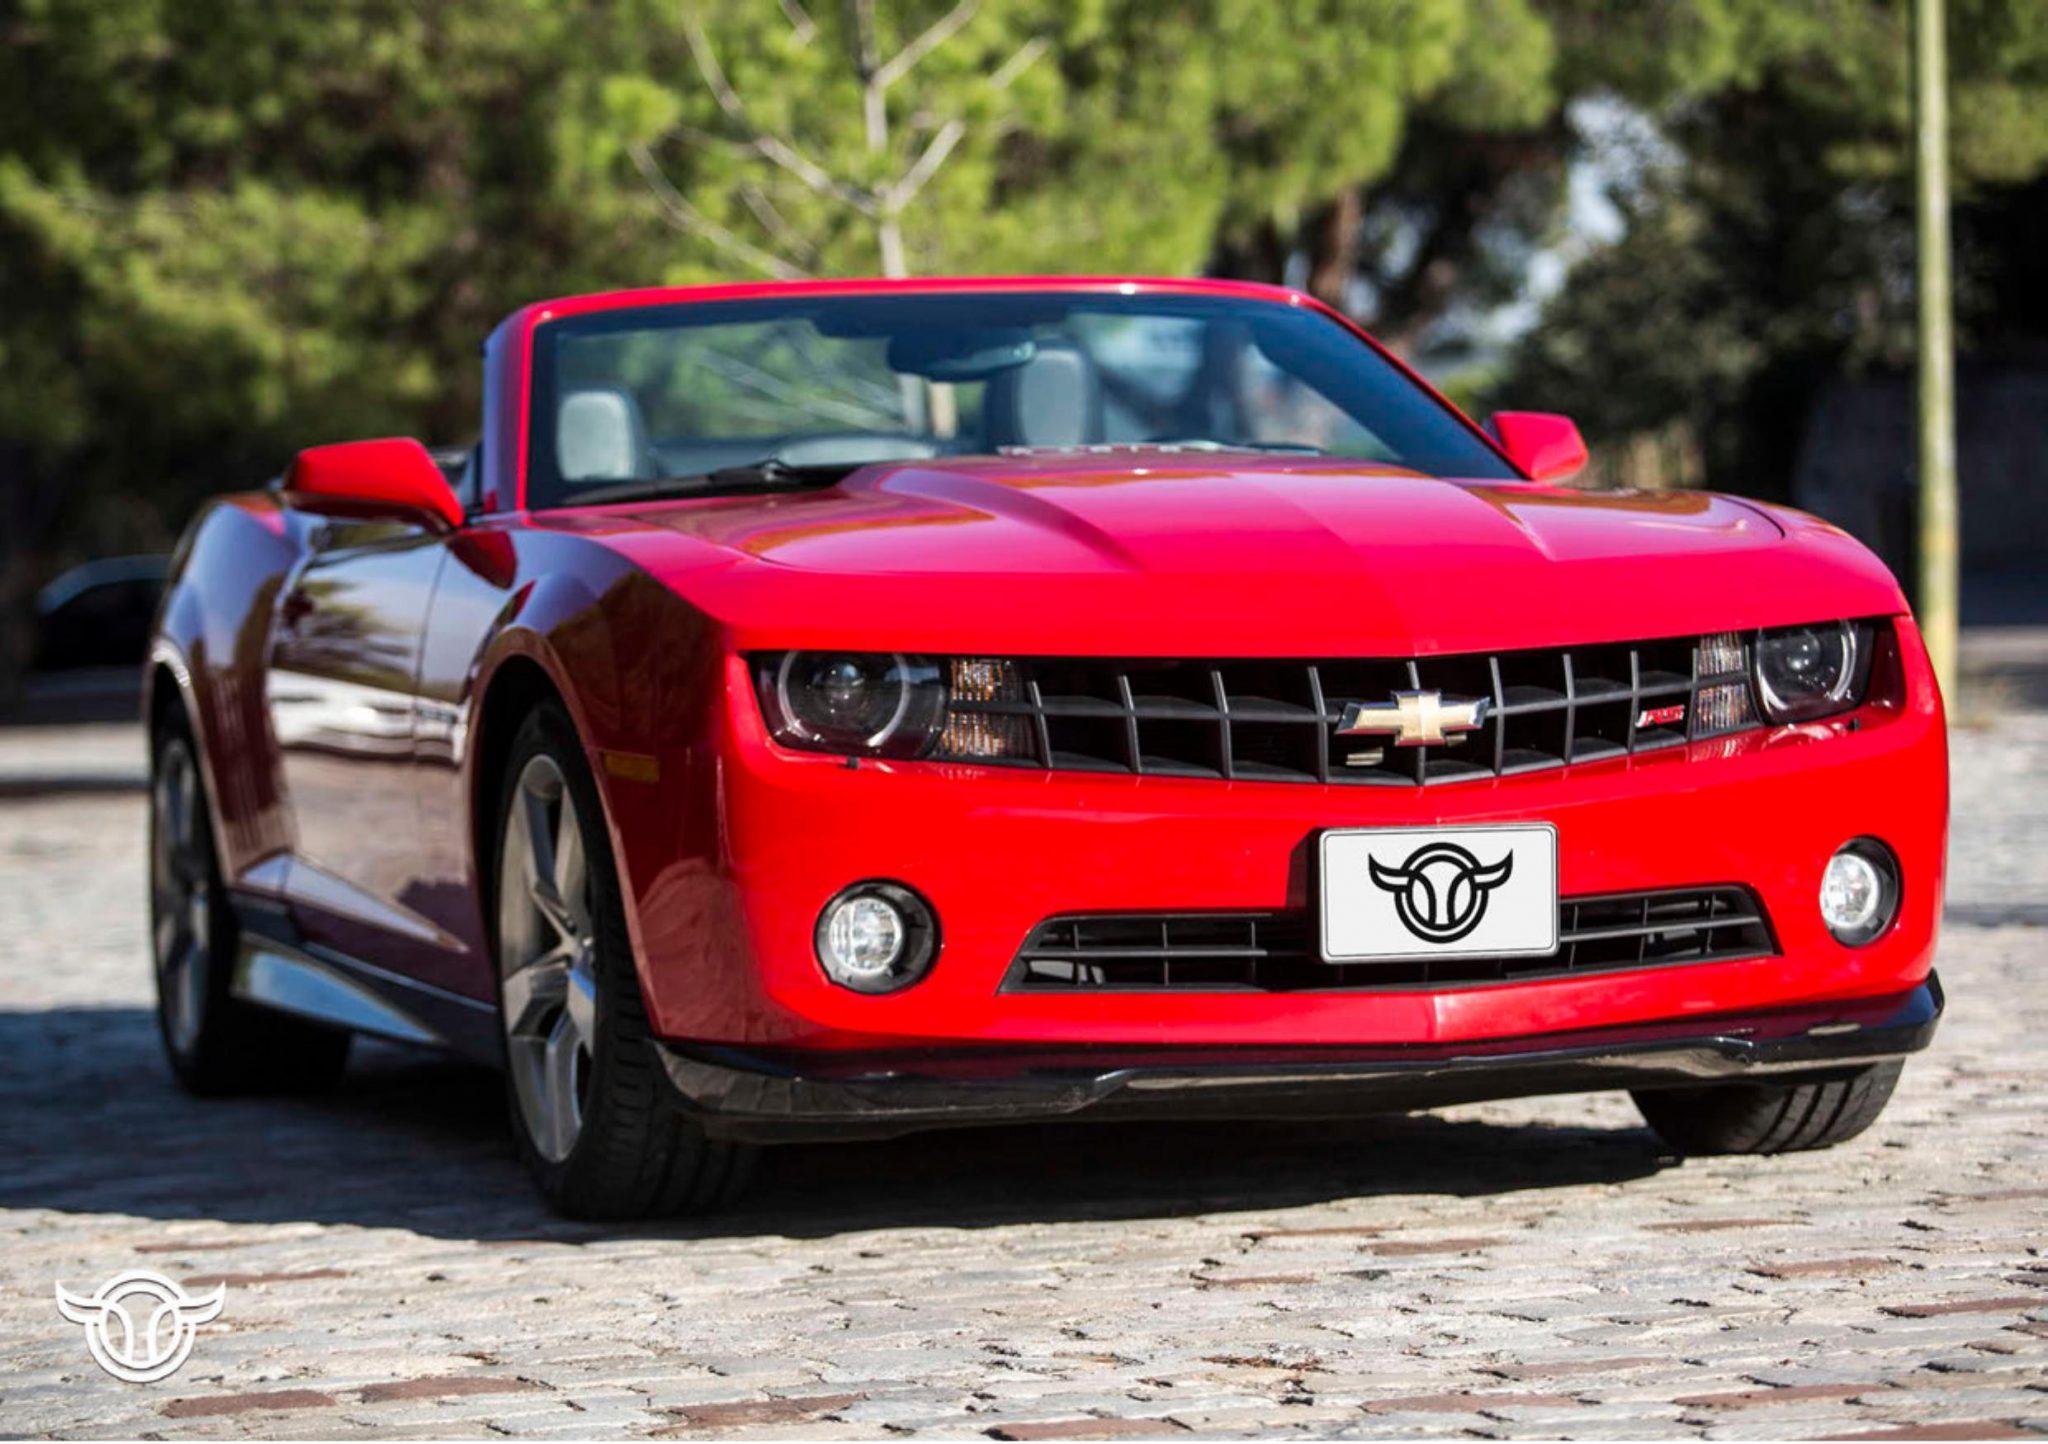 Chevrolet Camaro alquilar coches de lujo madrid marbella ibiza barcelona valencia